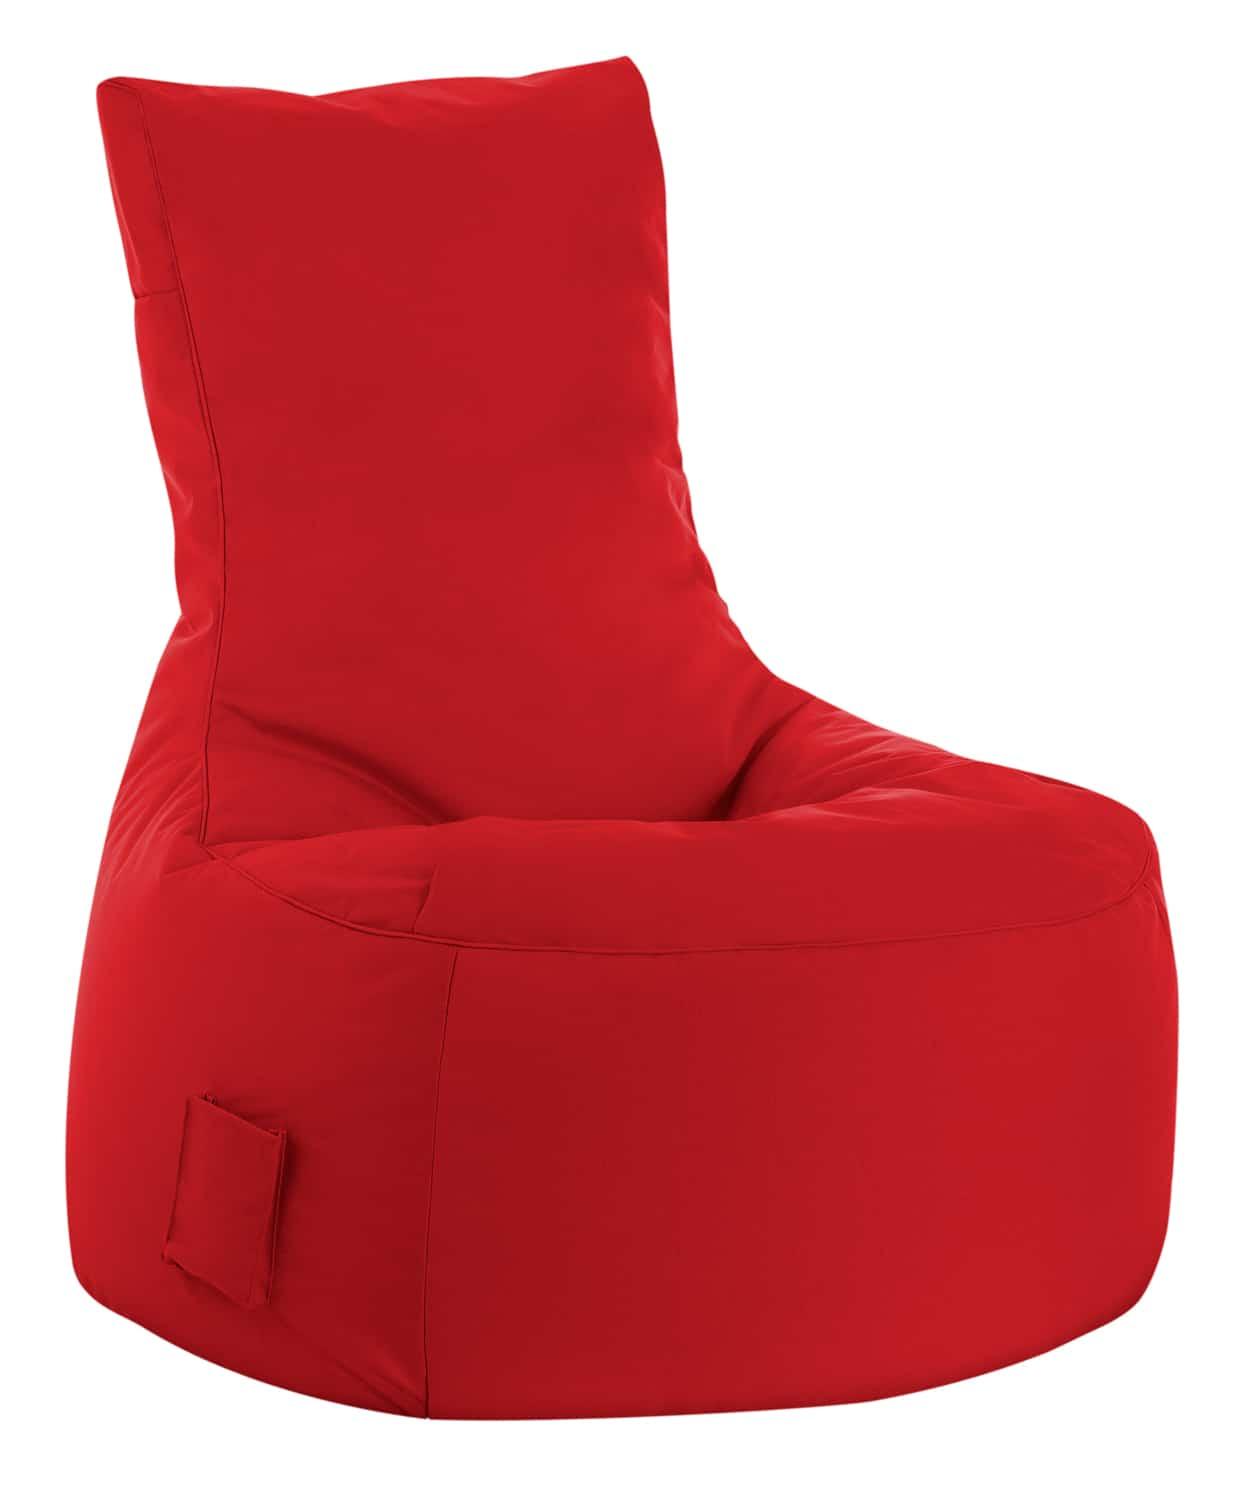 Zitzak stoel buiten rood sitting bags - Rots bobois stoel ...